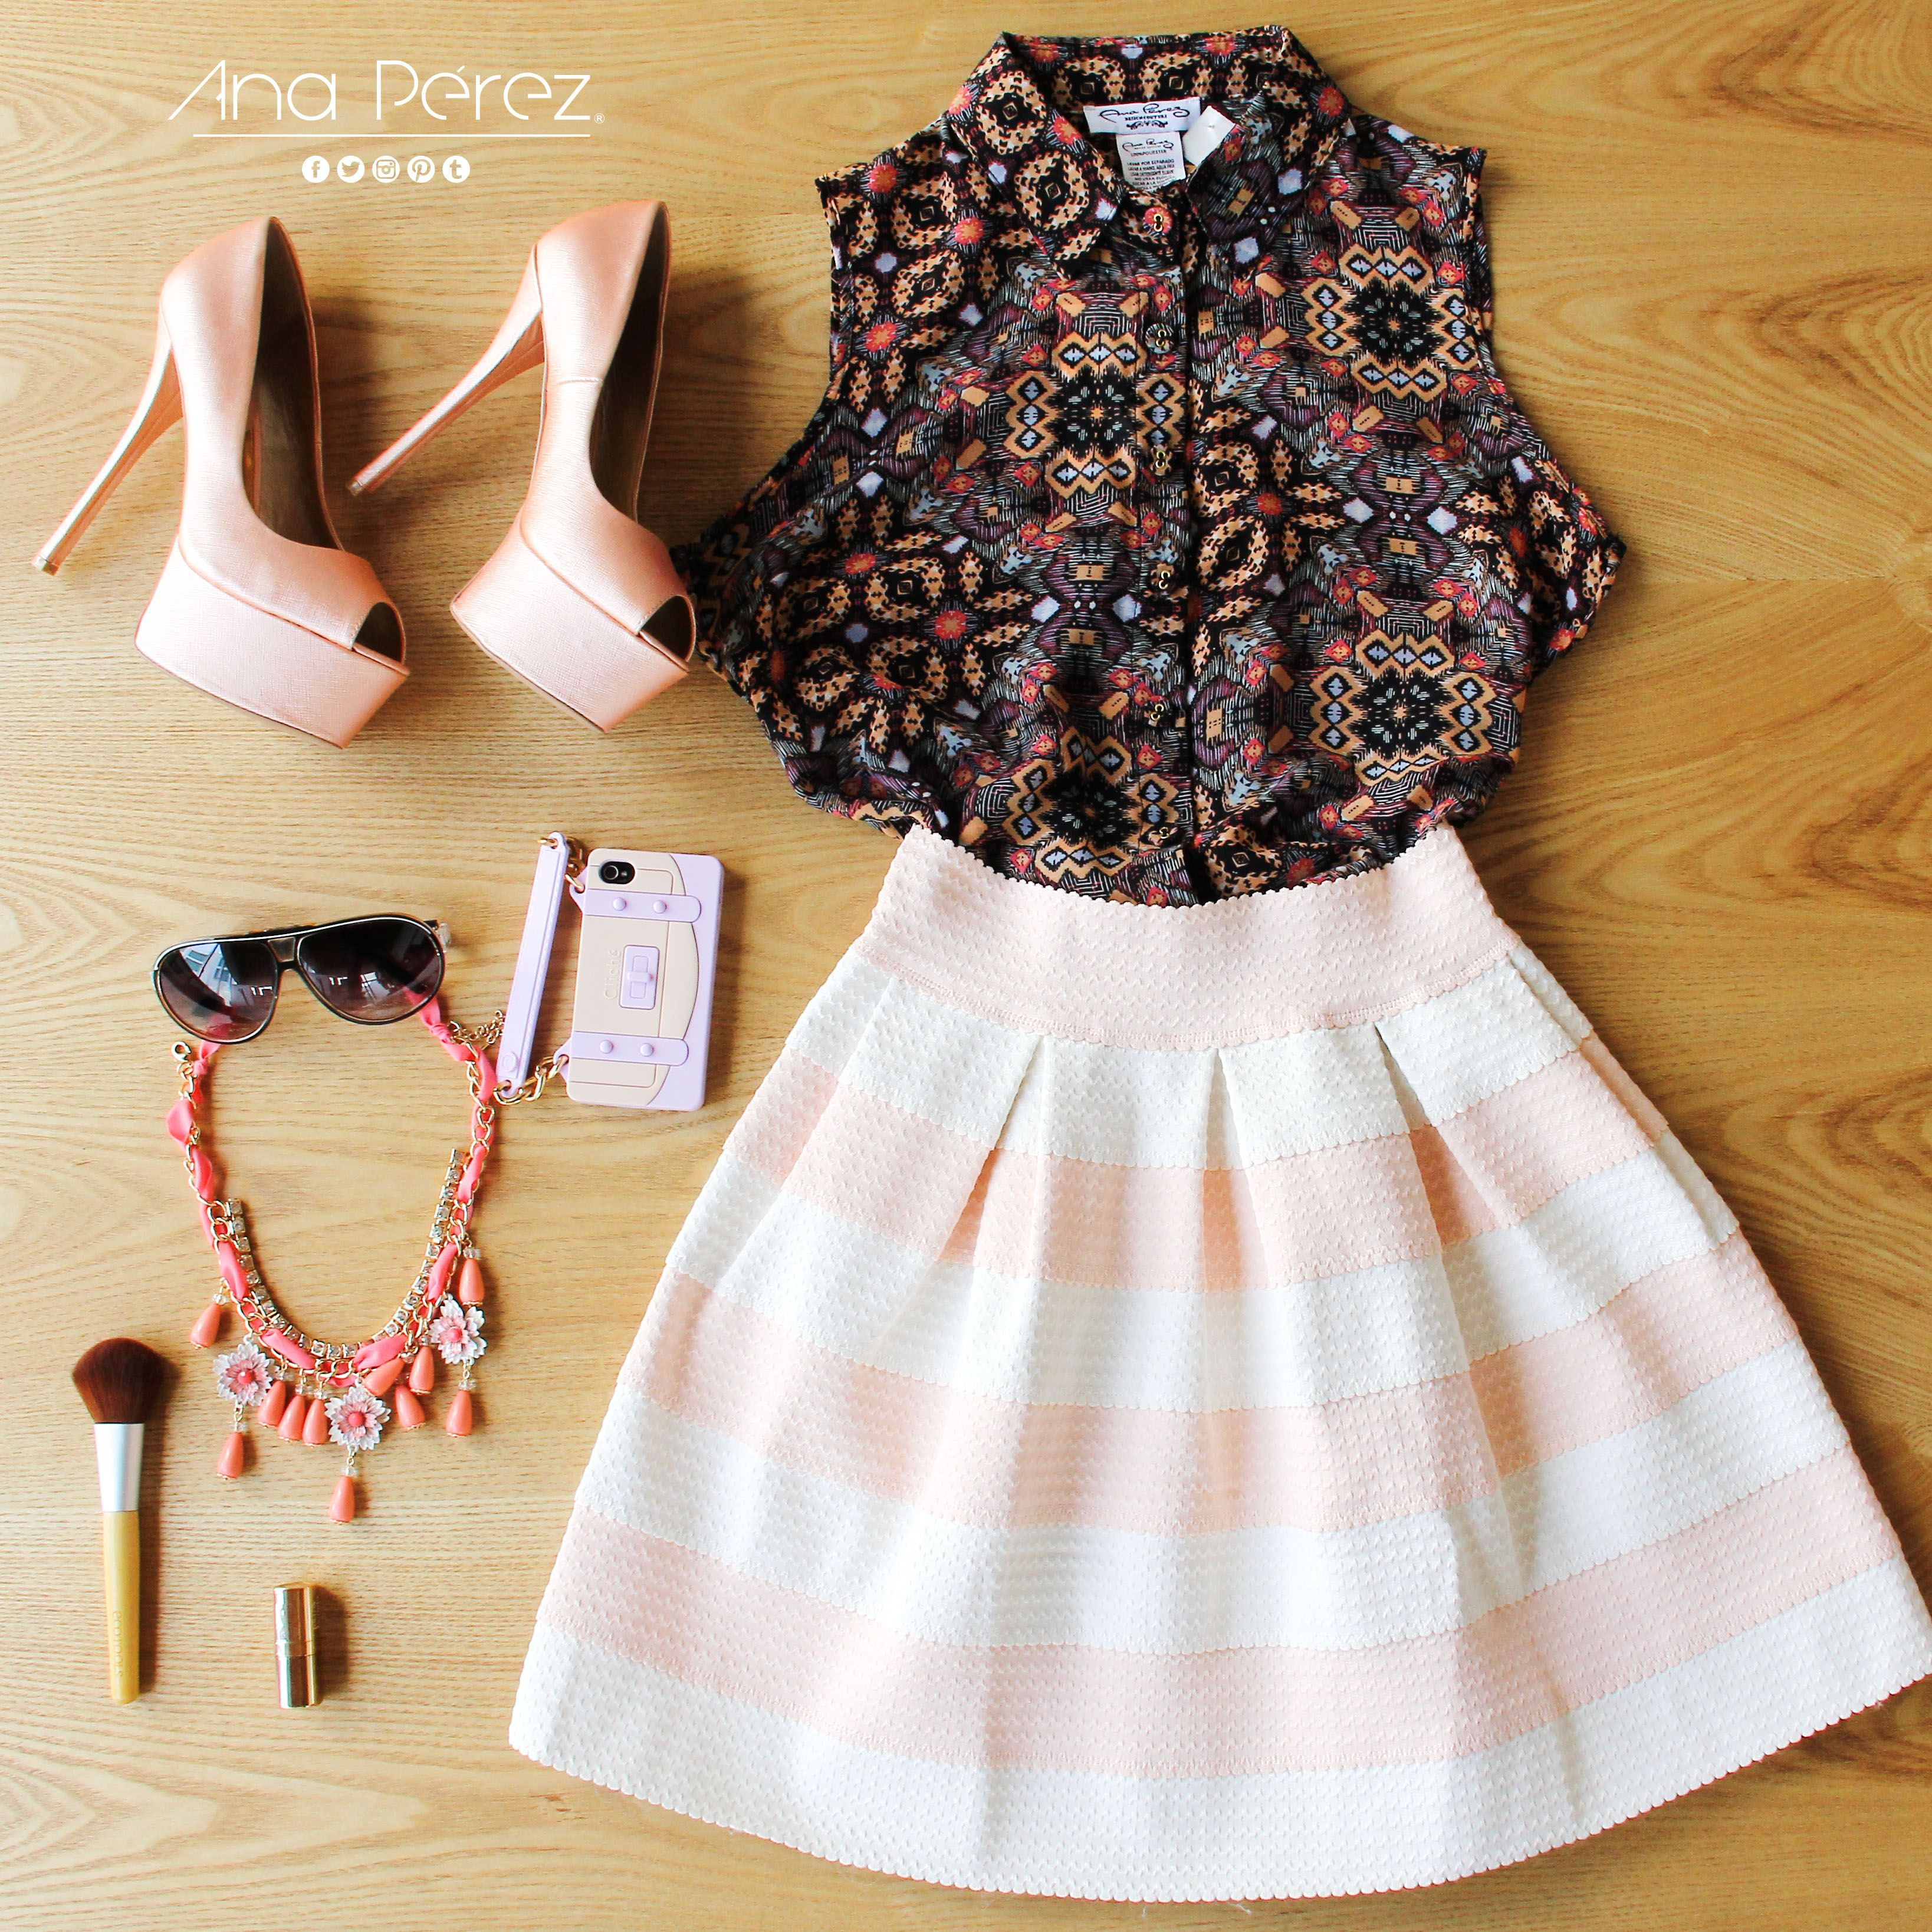 PERFECCIÓN TOTAL <3 <3 <3 #casual #trendy #shopp #beauty #girl #fresco #trendy #summer #shop #love #flores #TFLers #tweegram LIKE LIKE LIKE